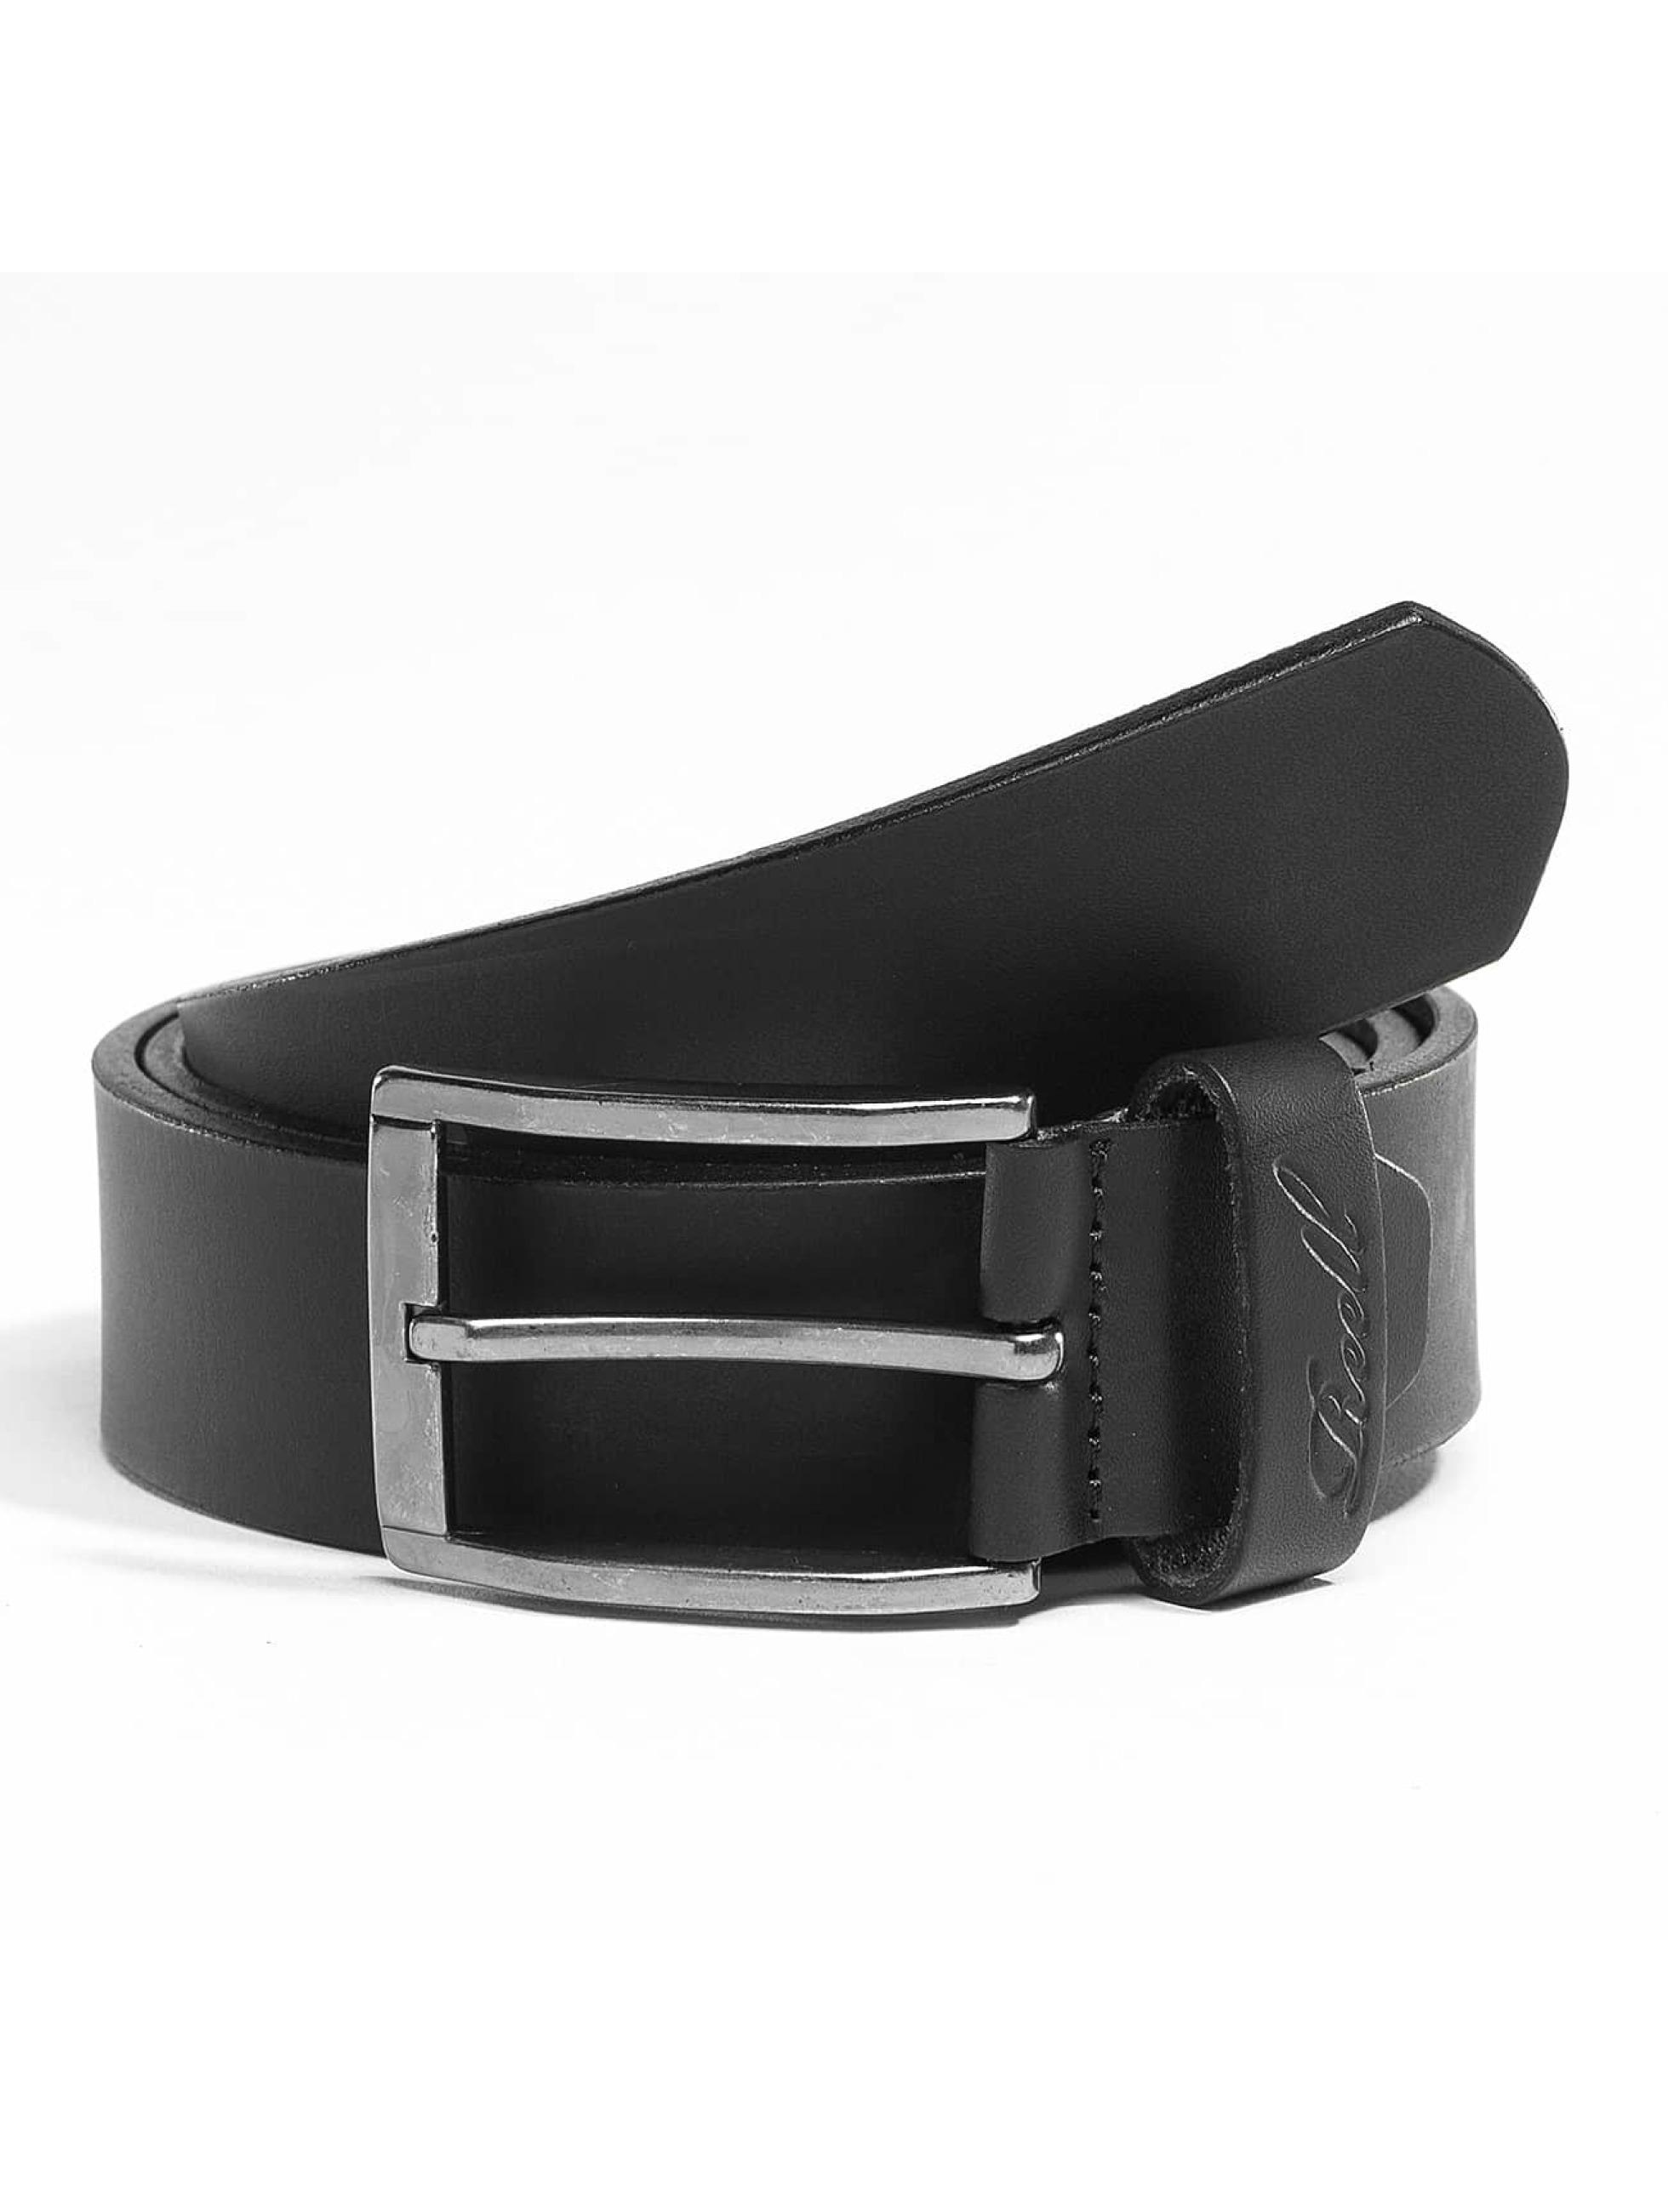 Reell Jeans Belt Narrow black